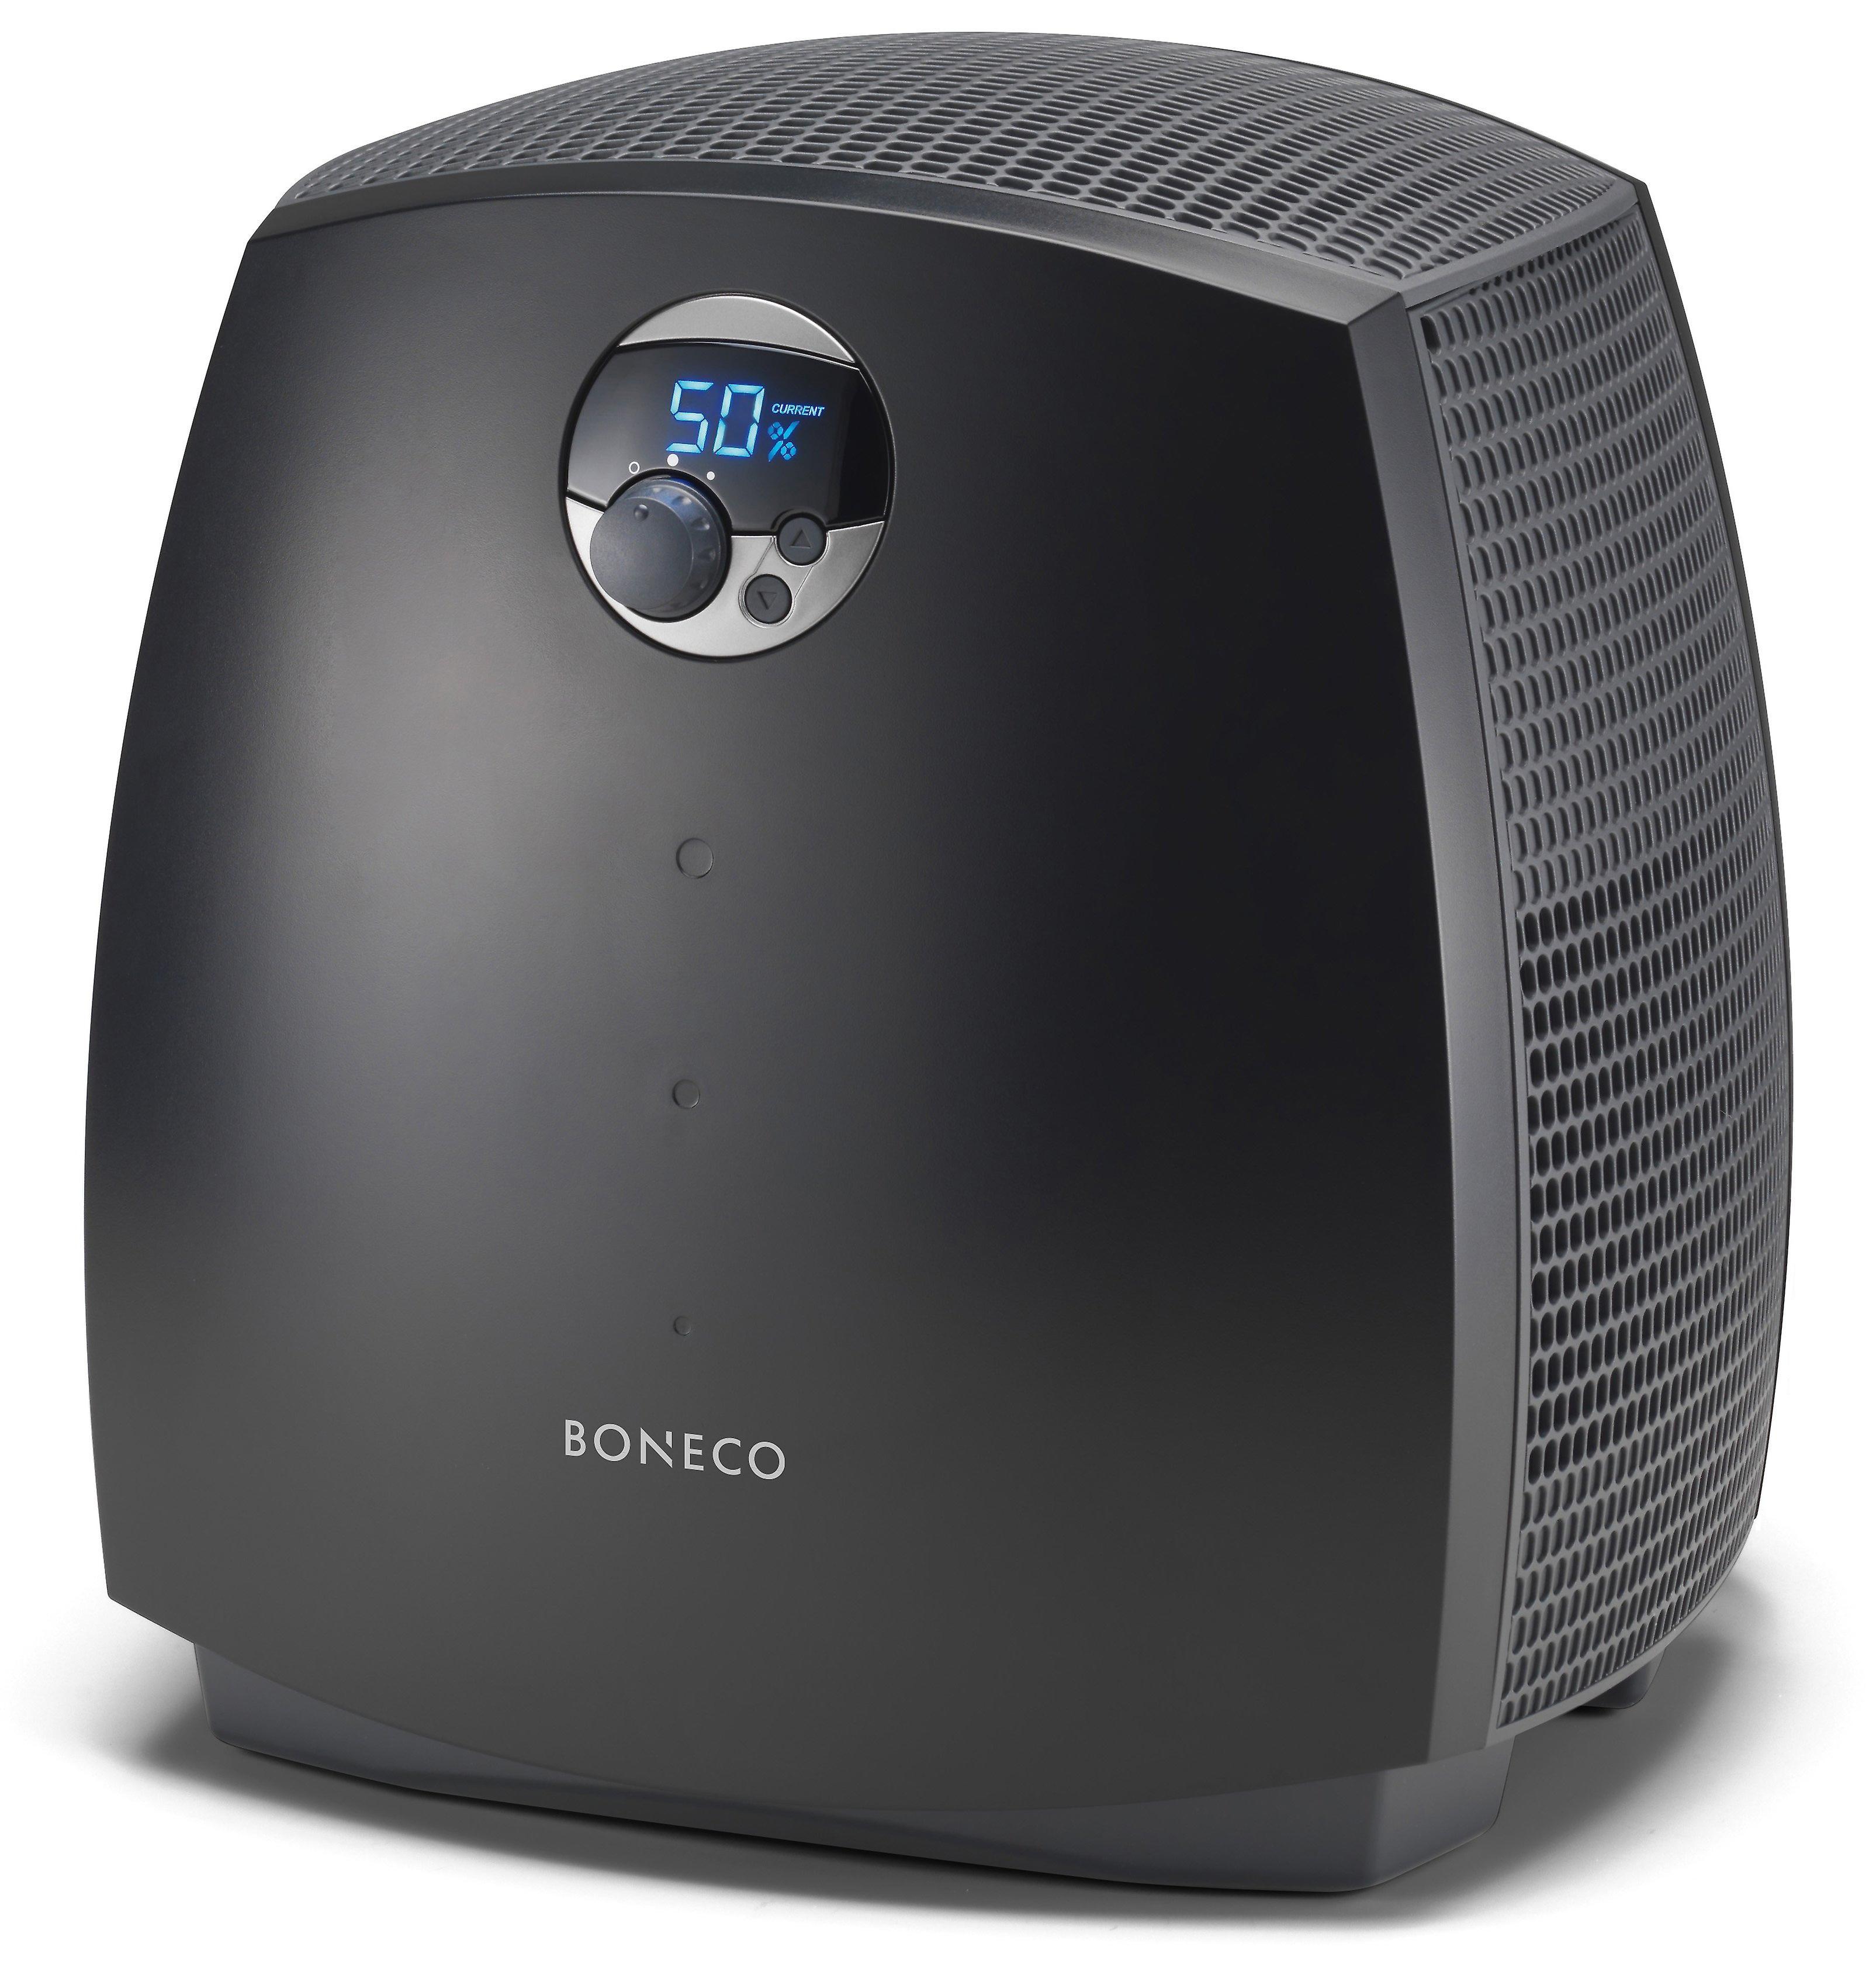 Boneco humidificateur épurateur d'air W2055D